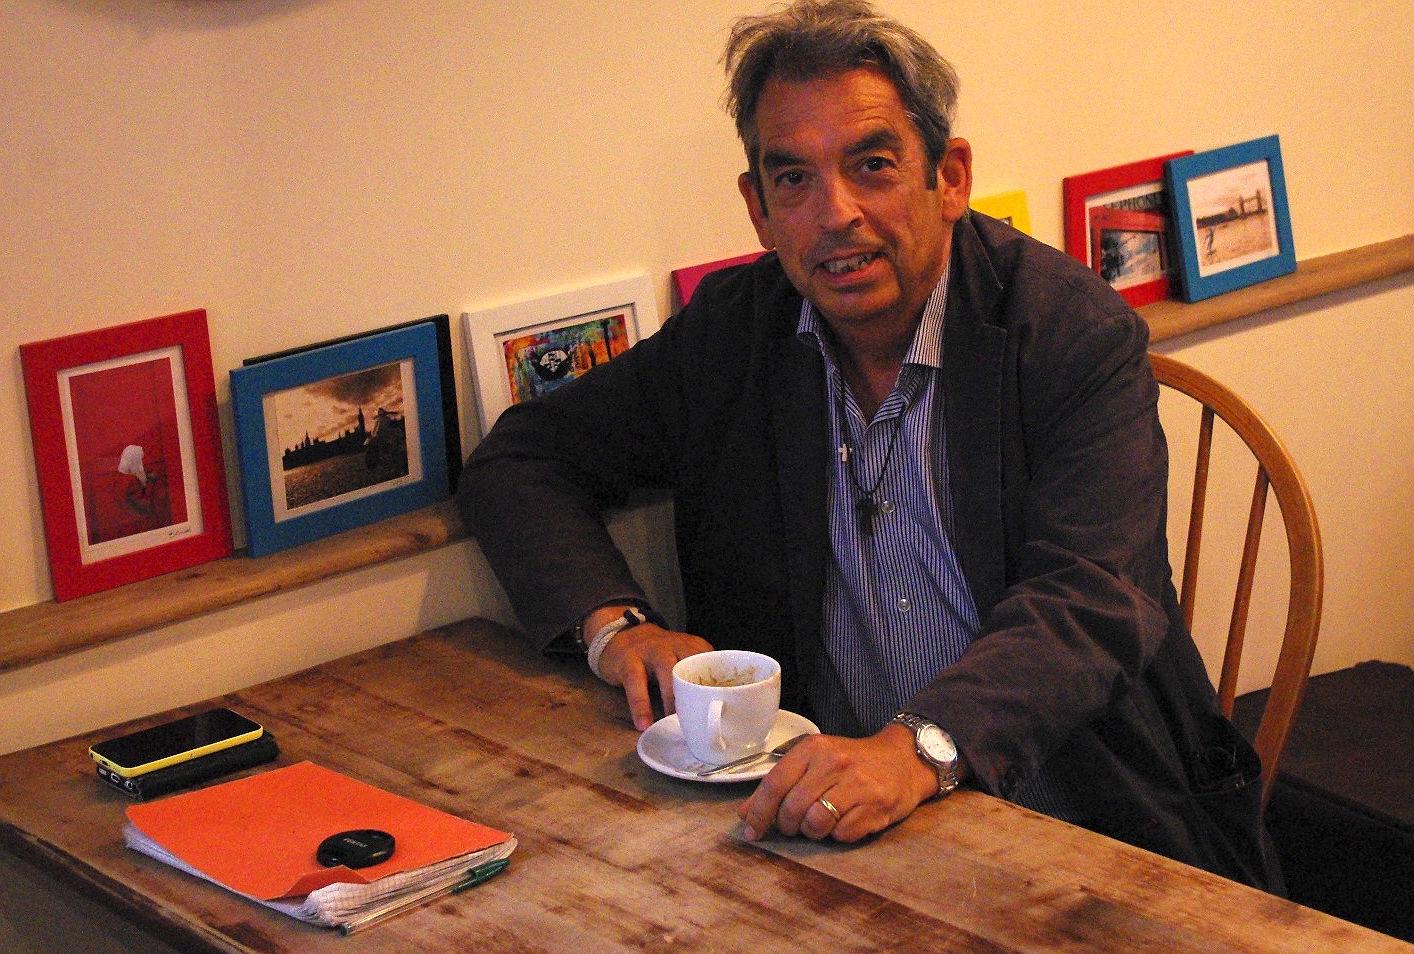 Battersea-based Jimmy Burns is president of the British Spanish society. Photo: Stephanie Kennedy